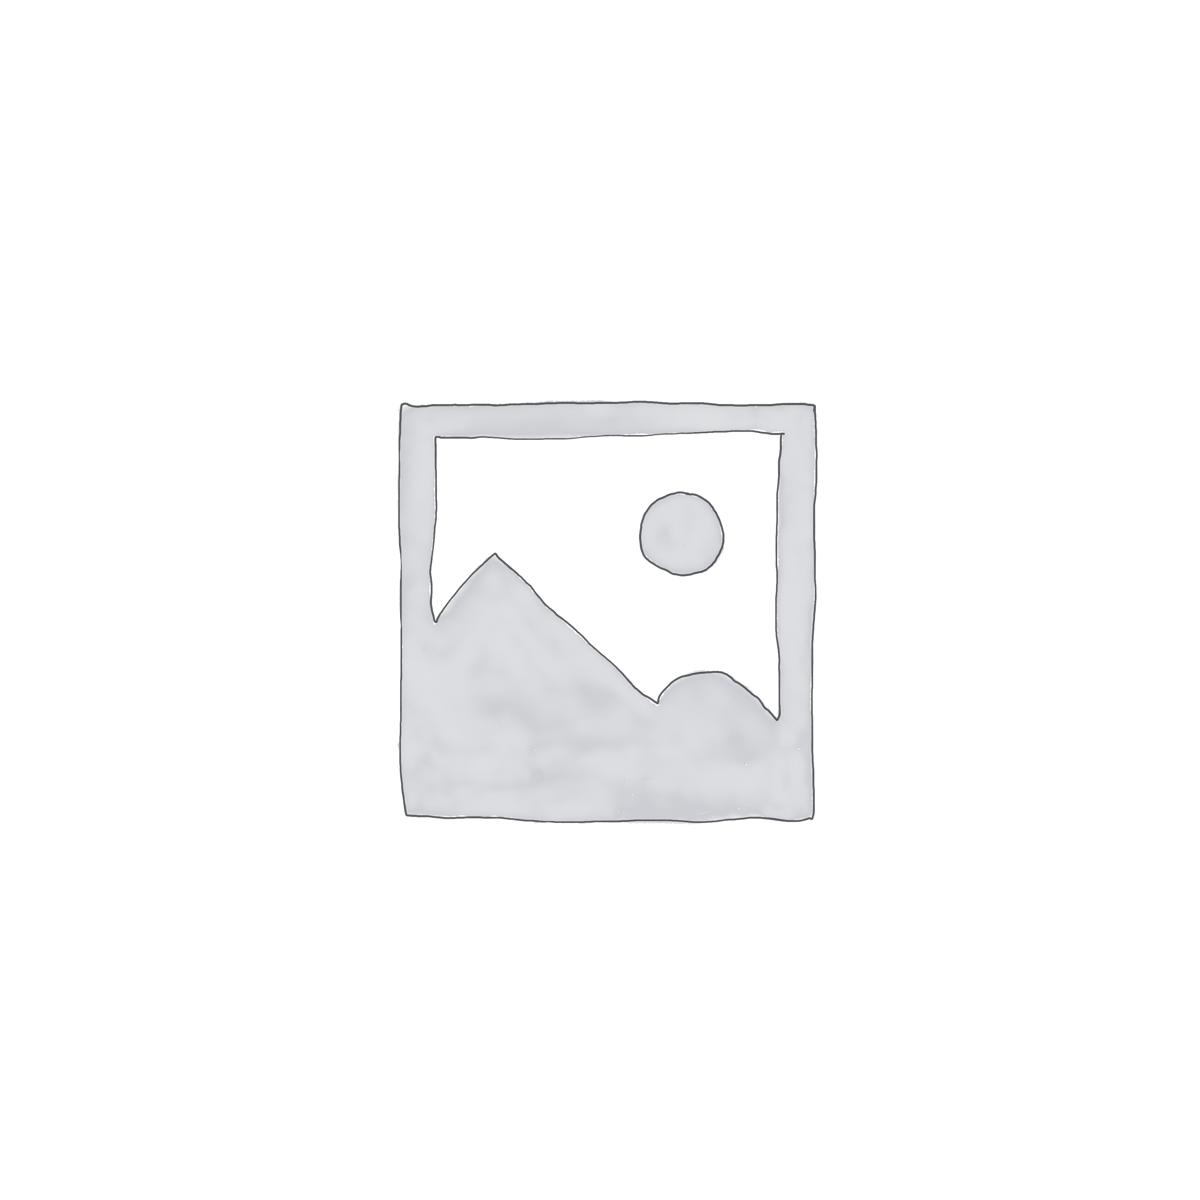 Monochrome Dark Blue Snowy Forest with Horned Deer Silhouette for Kids Nursery Wallpaper Mural